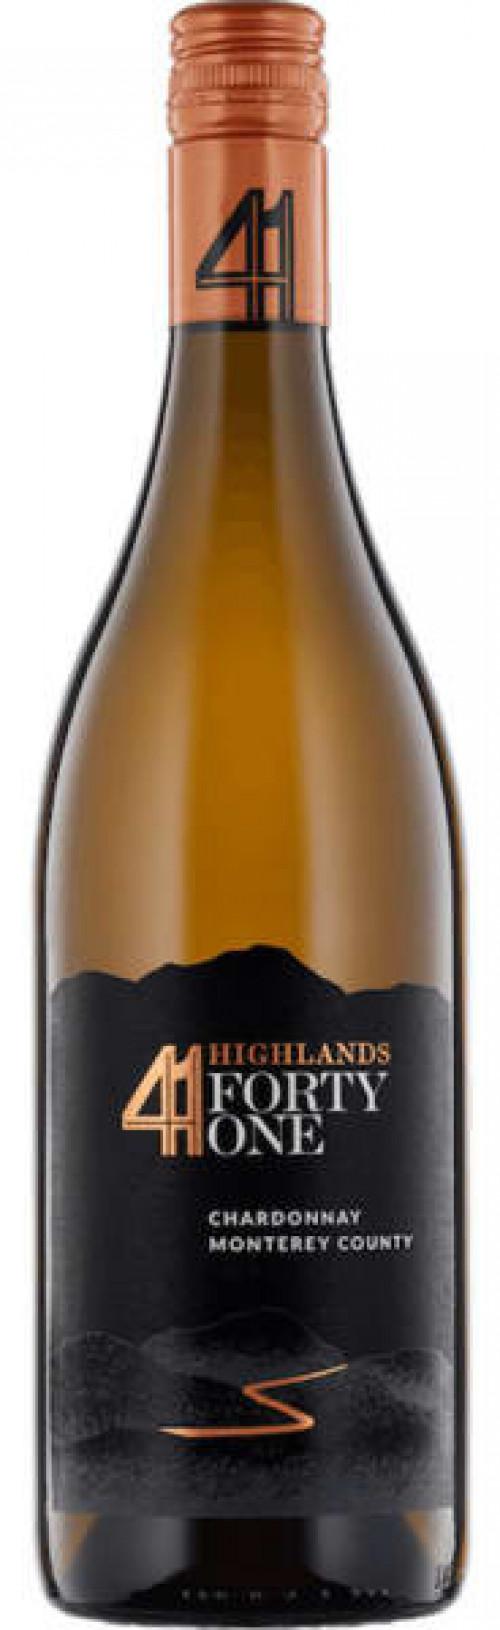 2019 Highlands 41 Chardonnay 750ml